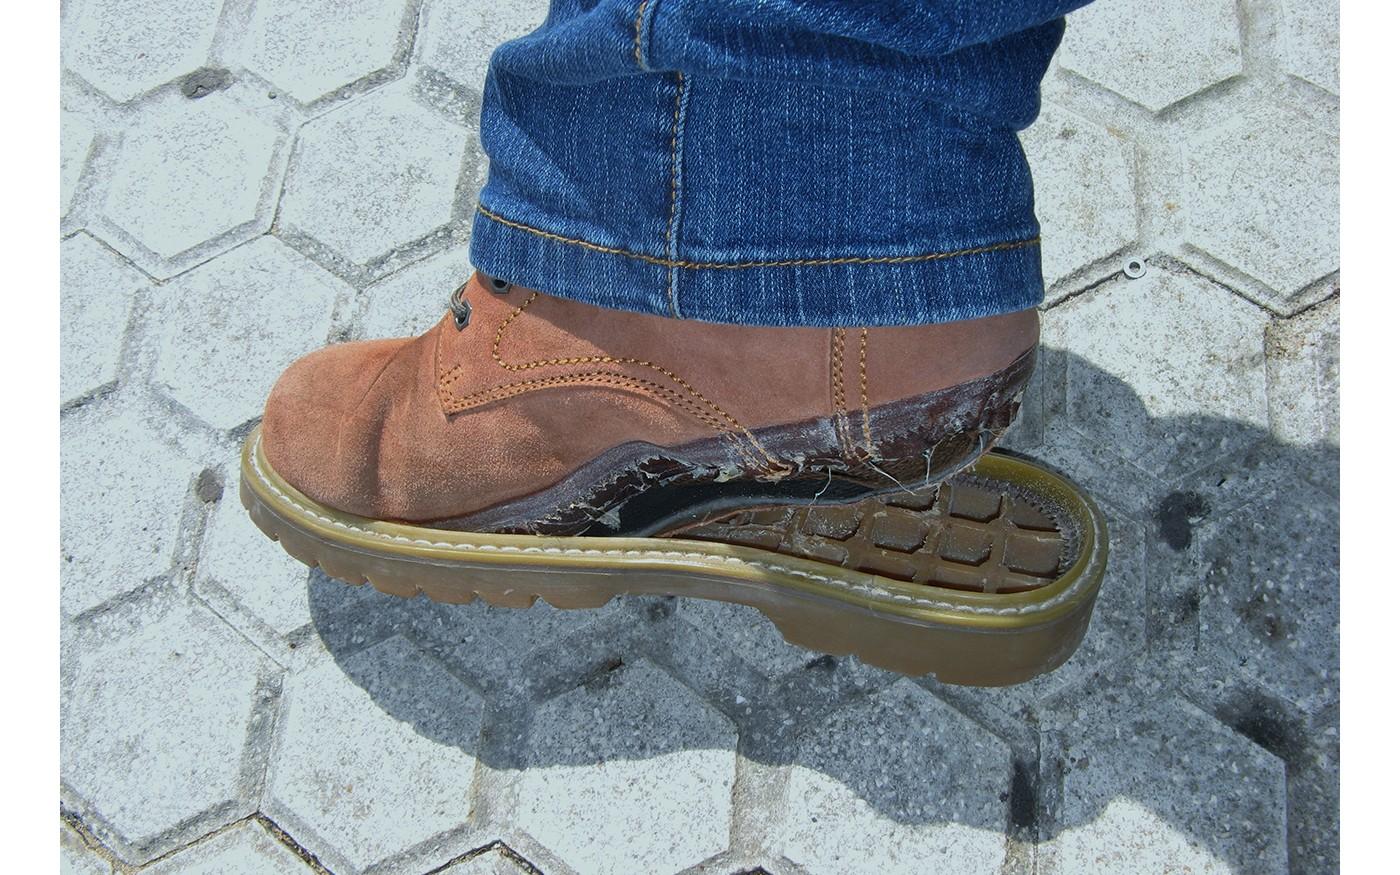 Lose Schuhsohle an einem Lederschuh